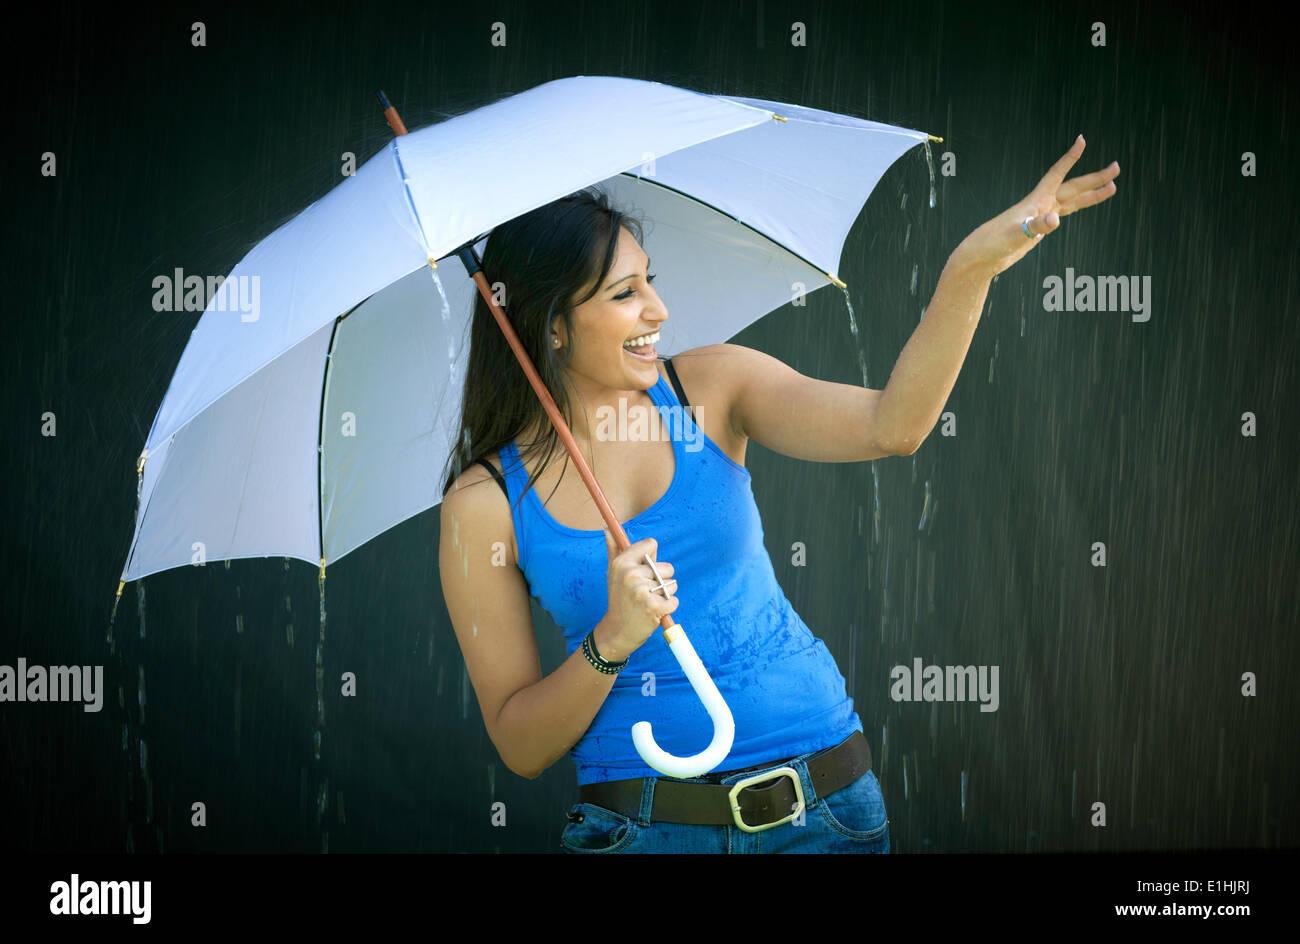 Smiling young woman holding an umbrella, enjoying the rain Stock Photo